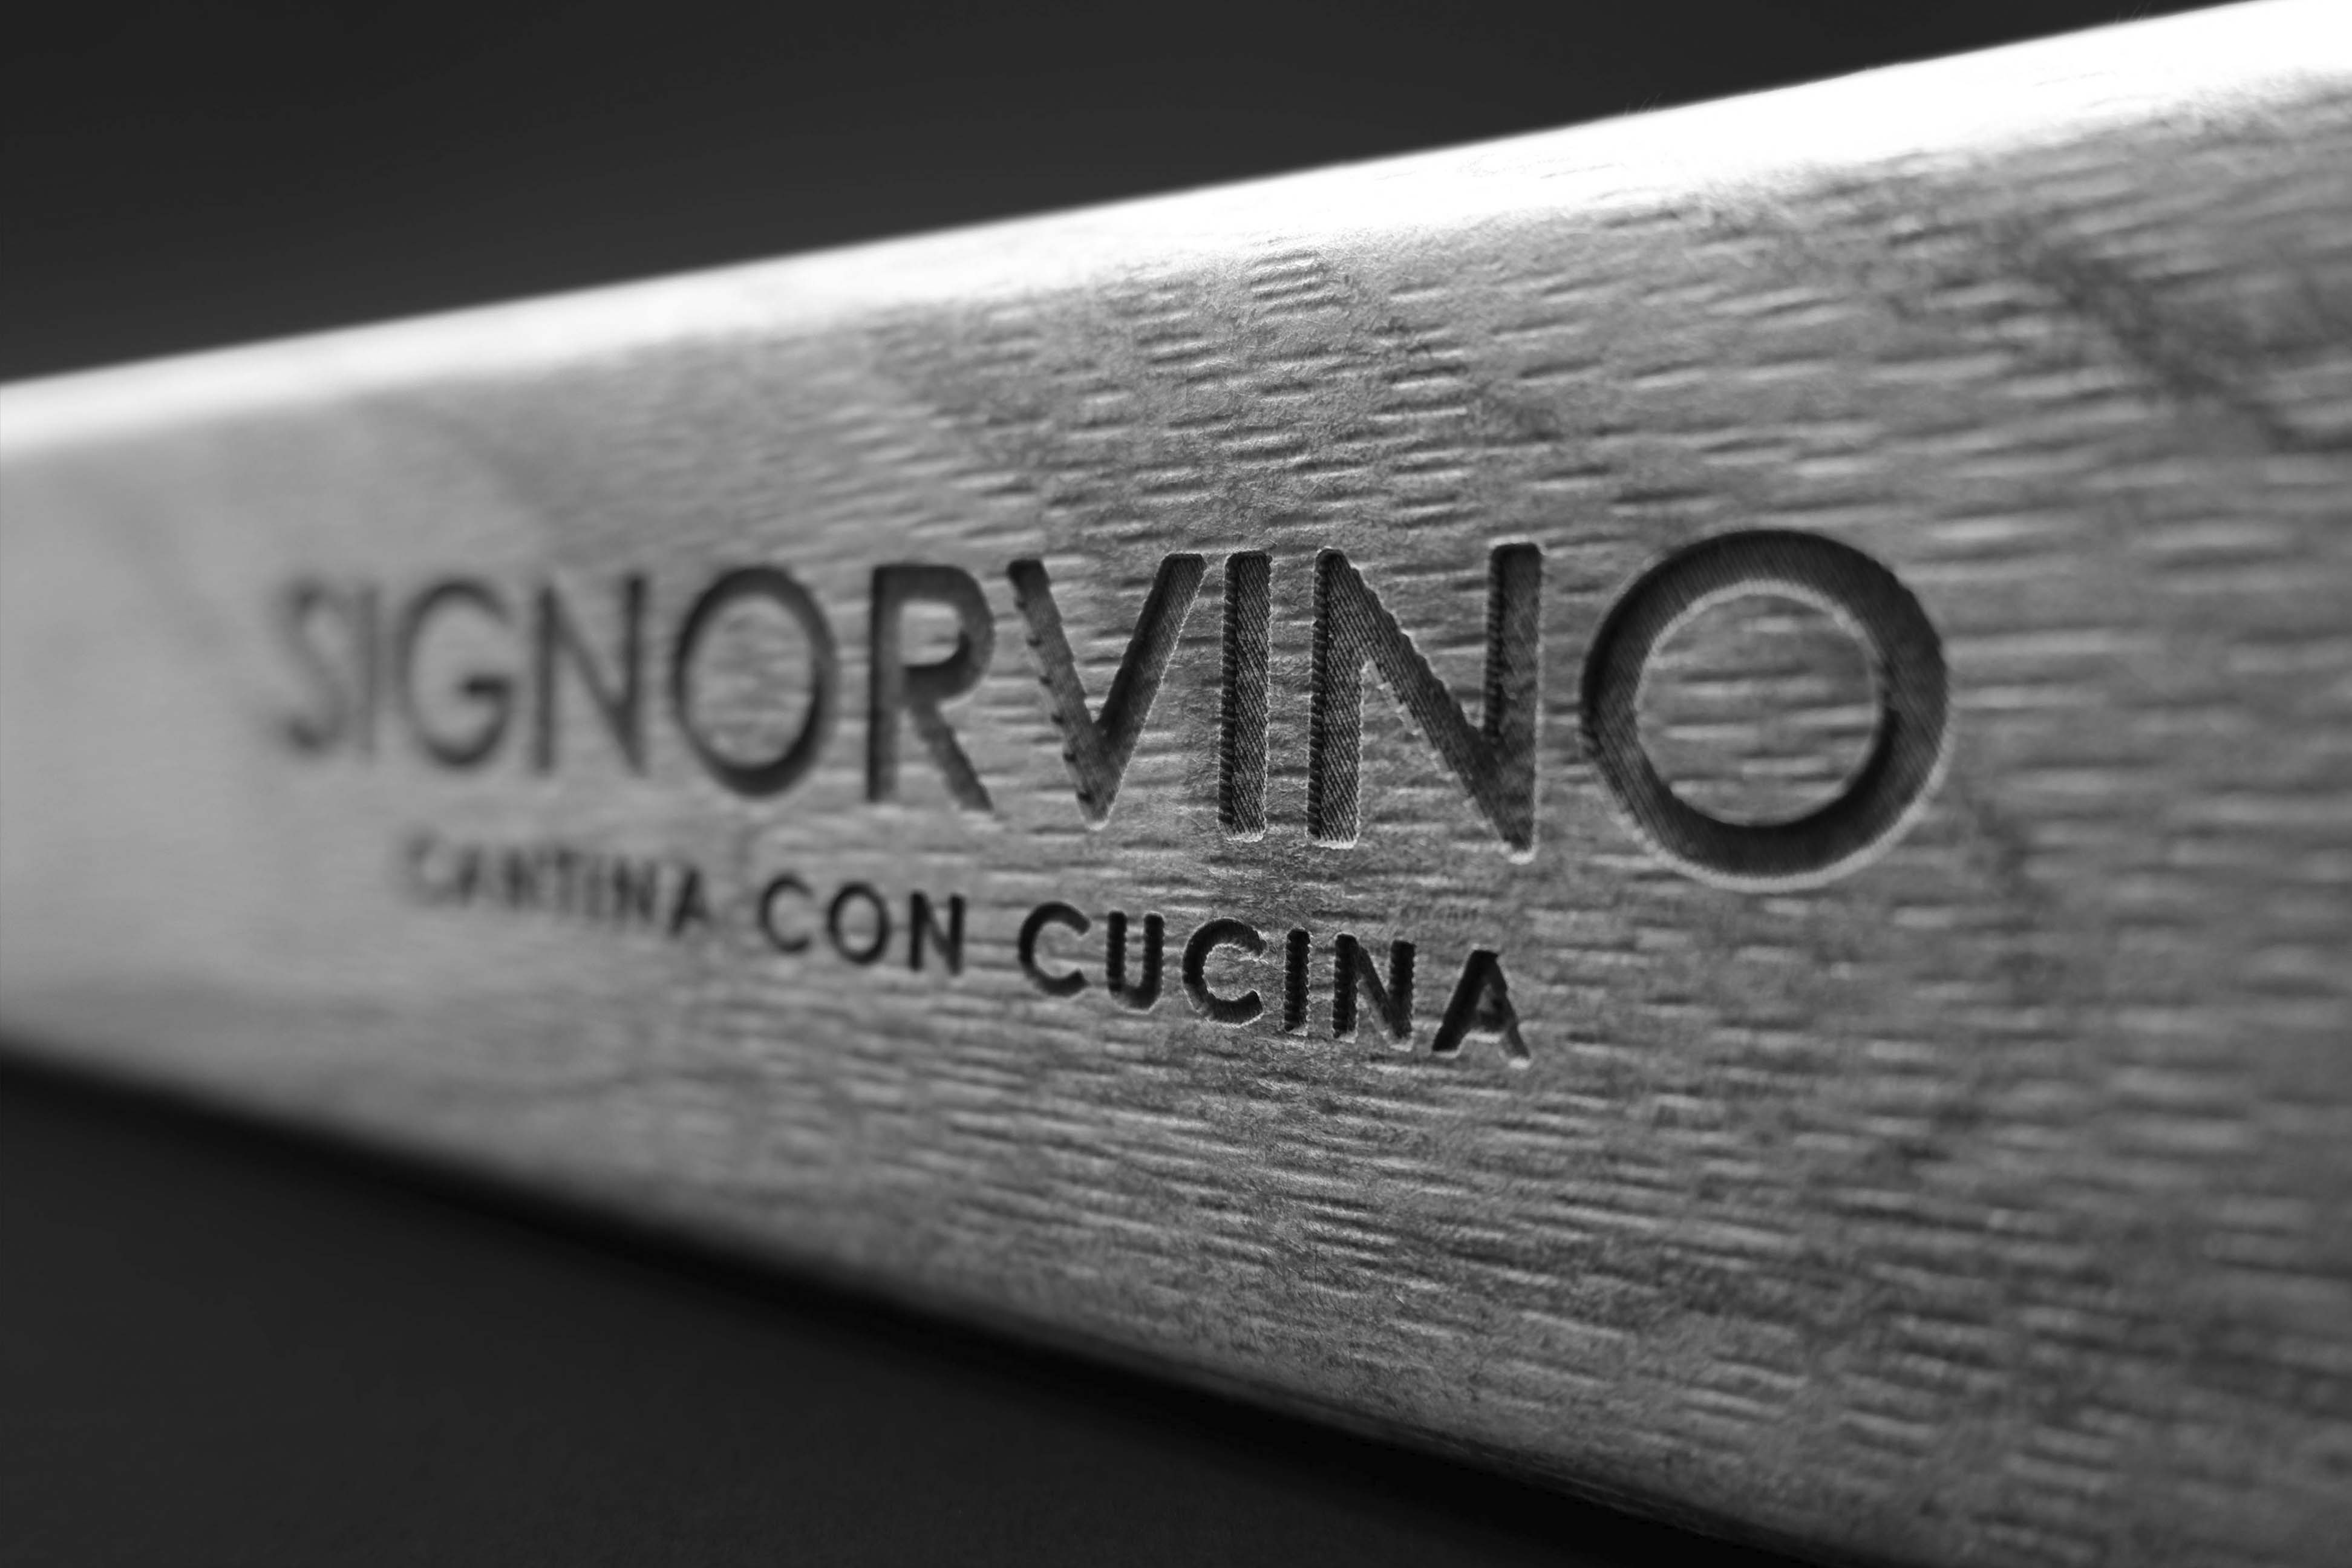 signorvino_lista_vini